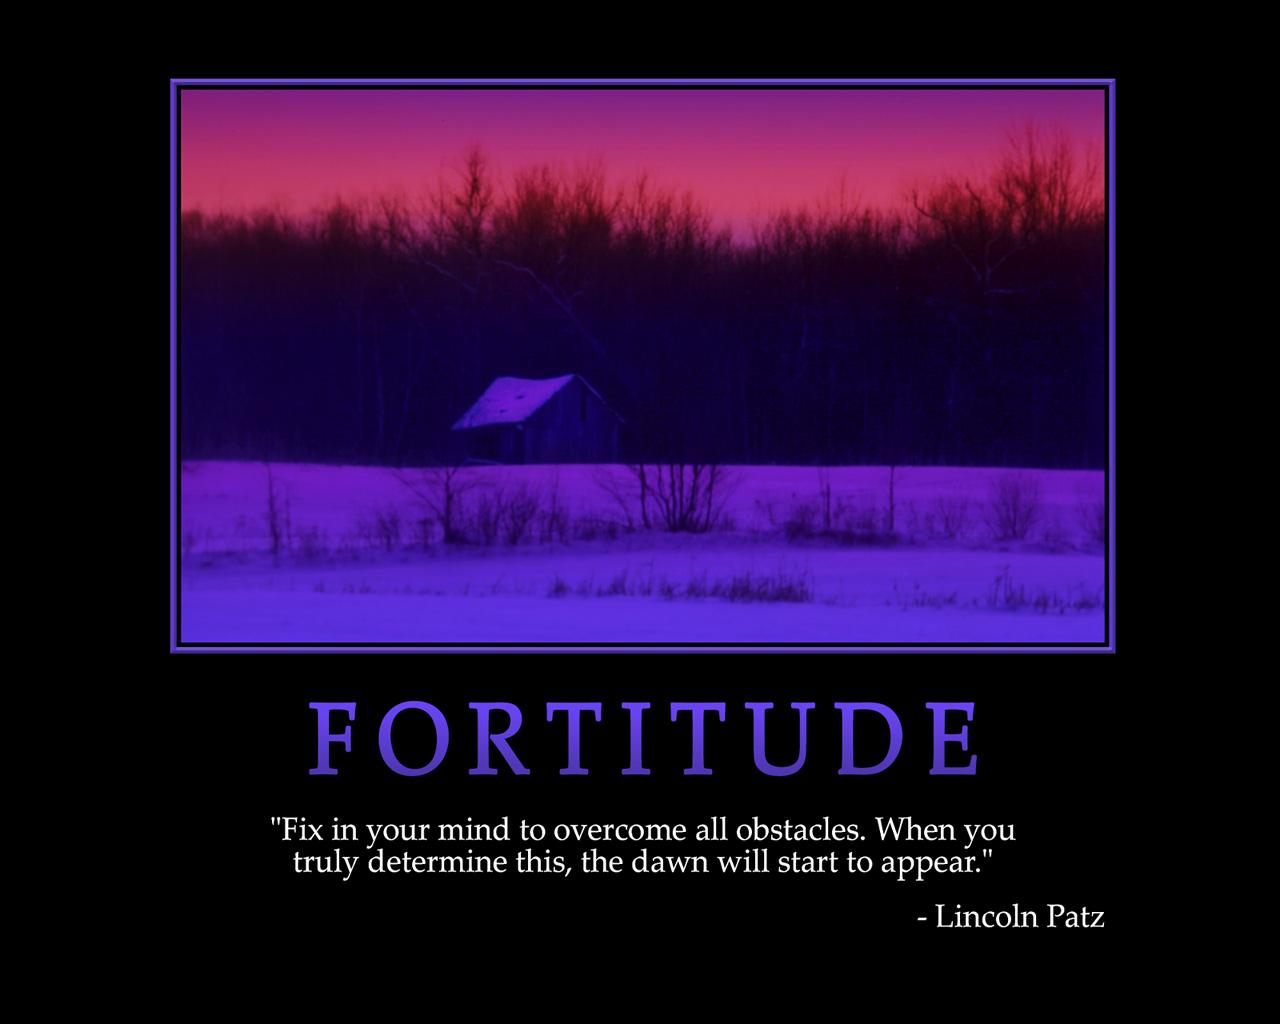 Fortitude Quotes Inspirational Quotesgram